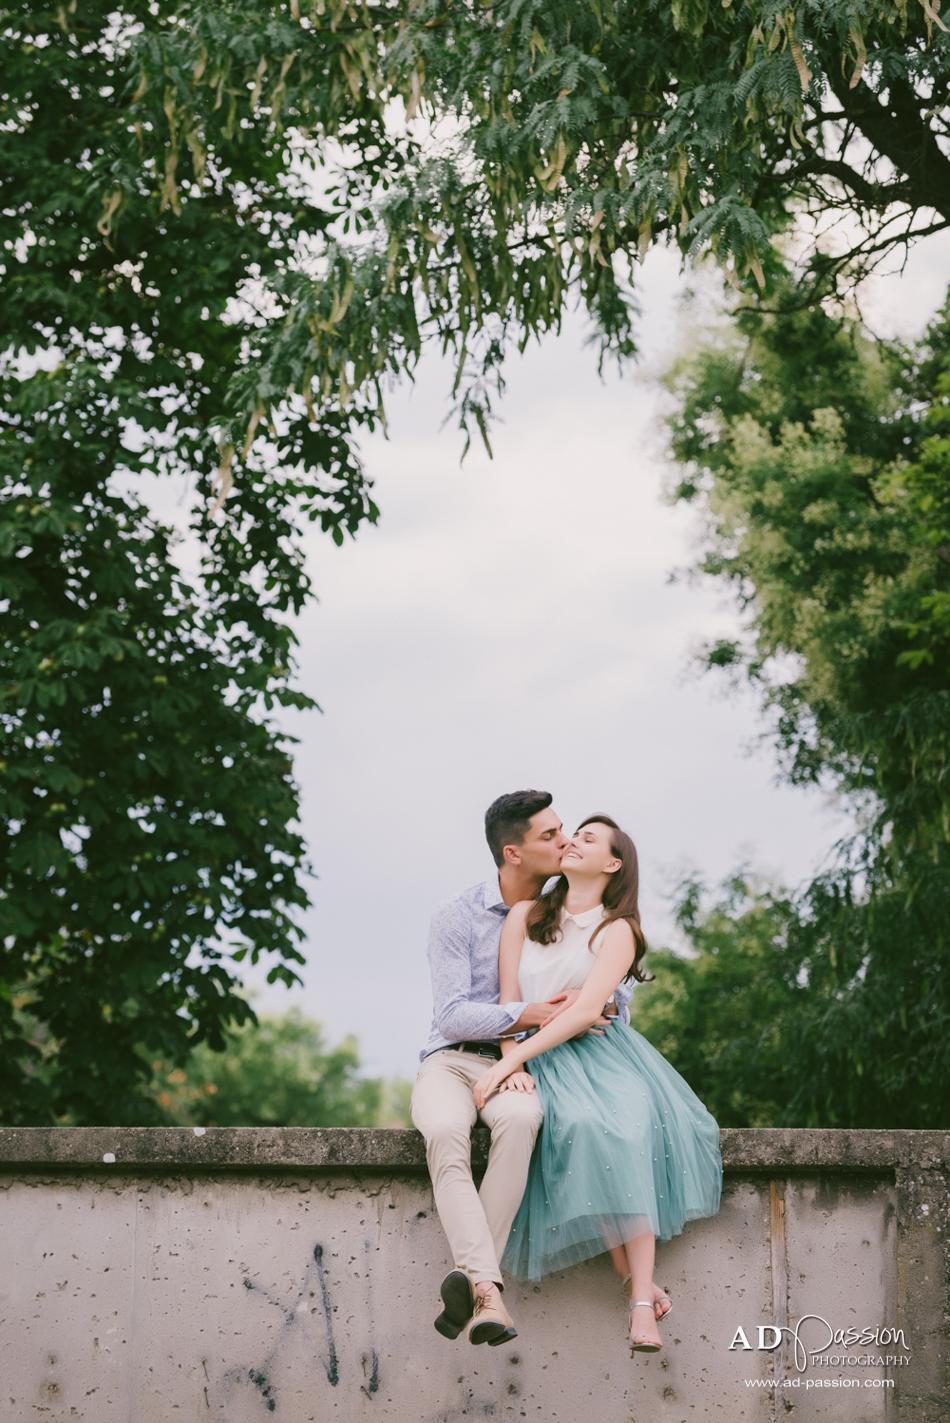 AD Passion Photography | aniversare-2-ani-alin-aura_0007 | Adelin, Dida, fotograf profesionist, fotograf de nunta, fotografie de nunta, fotograf Timisoara, fotograf Craiova, fotograf Bucuresti, fotograf Arad, nunta Timisoara, nunta Arad, nunta Bucuresti, nunta Craiova